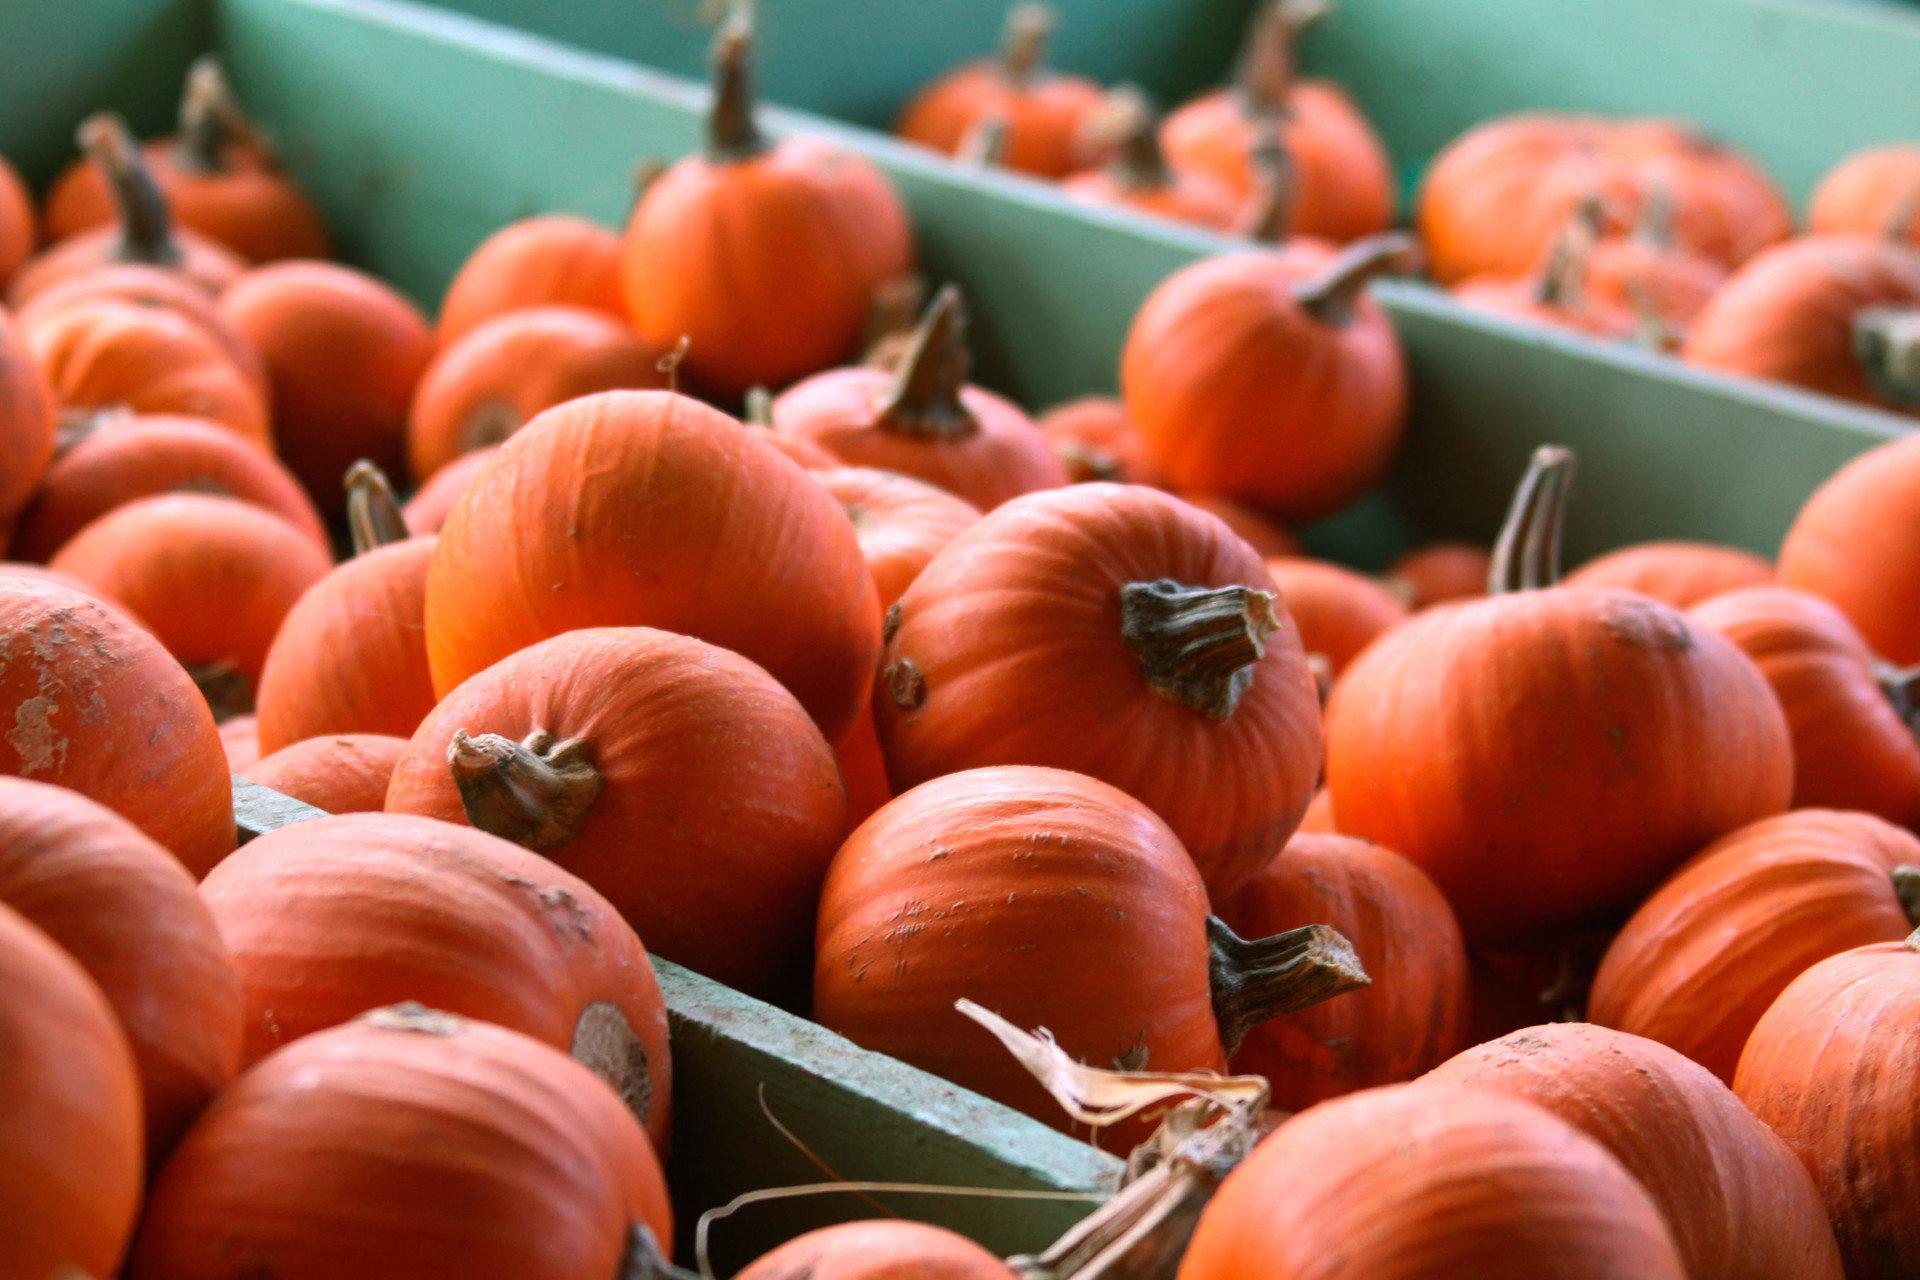 Offbeat fruit food produce plant squash pumpkin vegetable winter squash calabaza land plant flowering plant wooden oranges autumn sale fresh